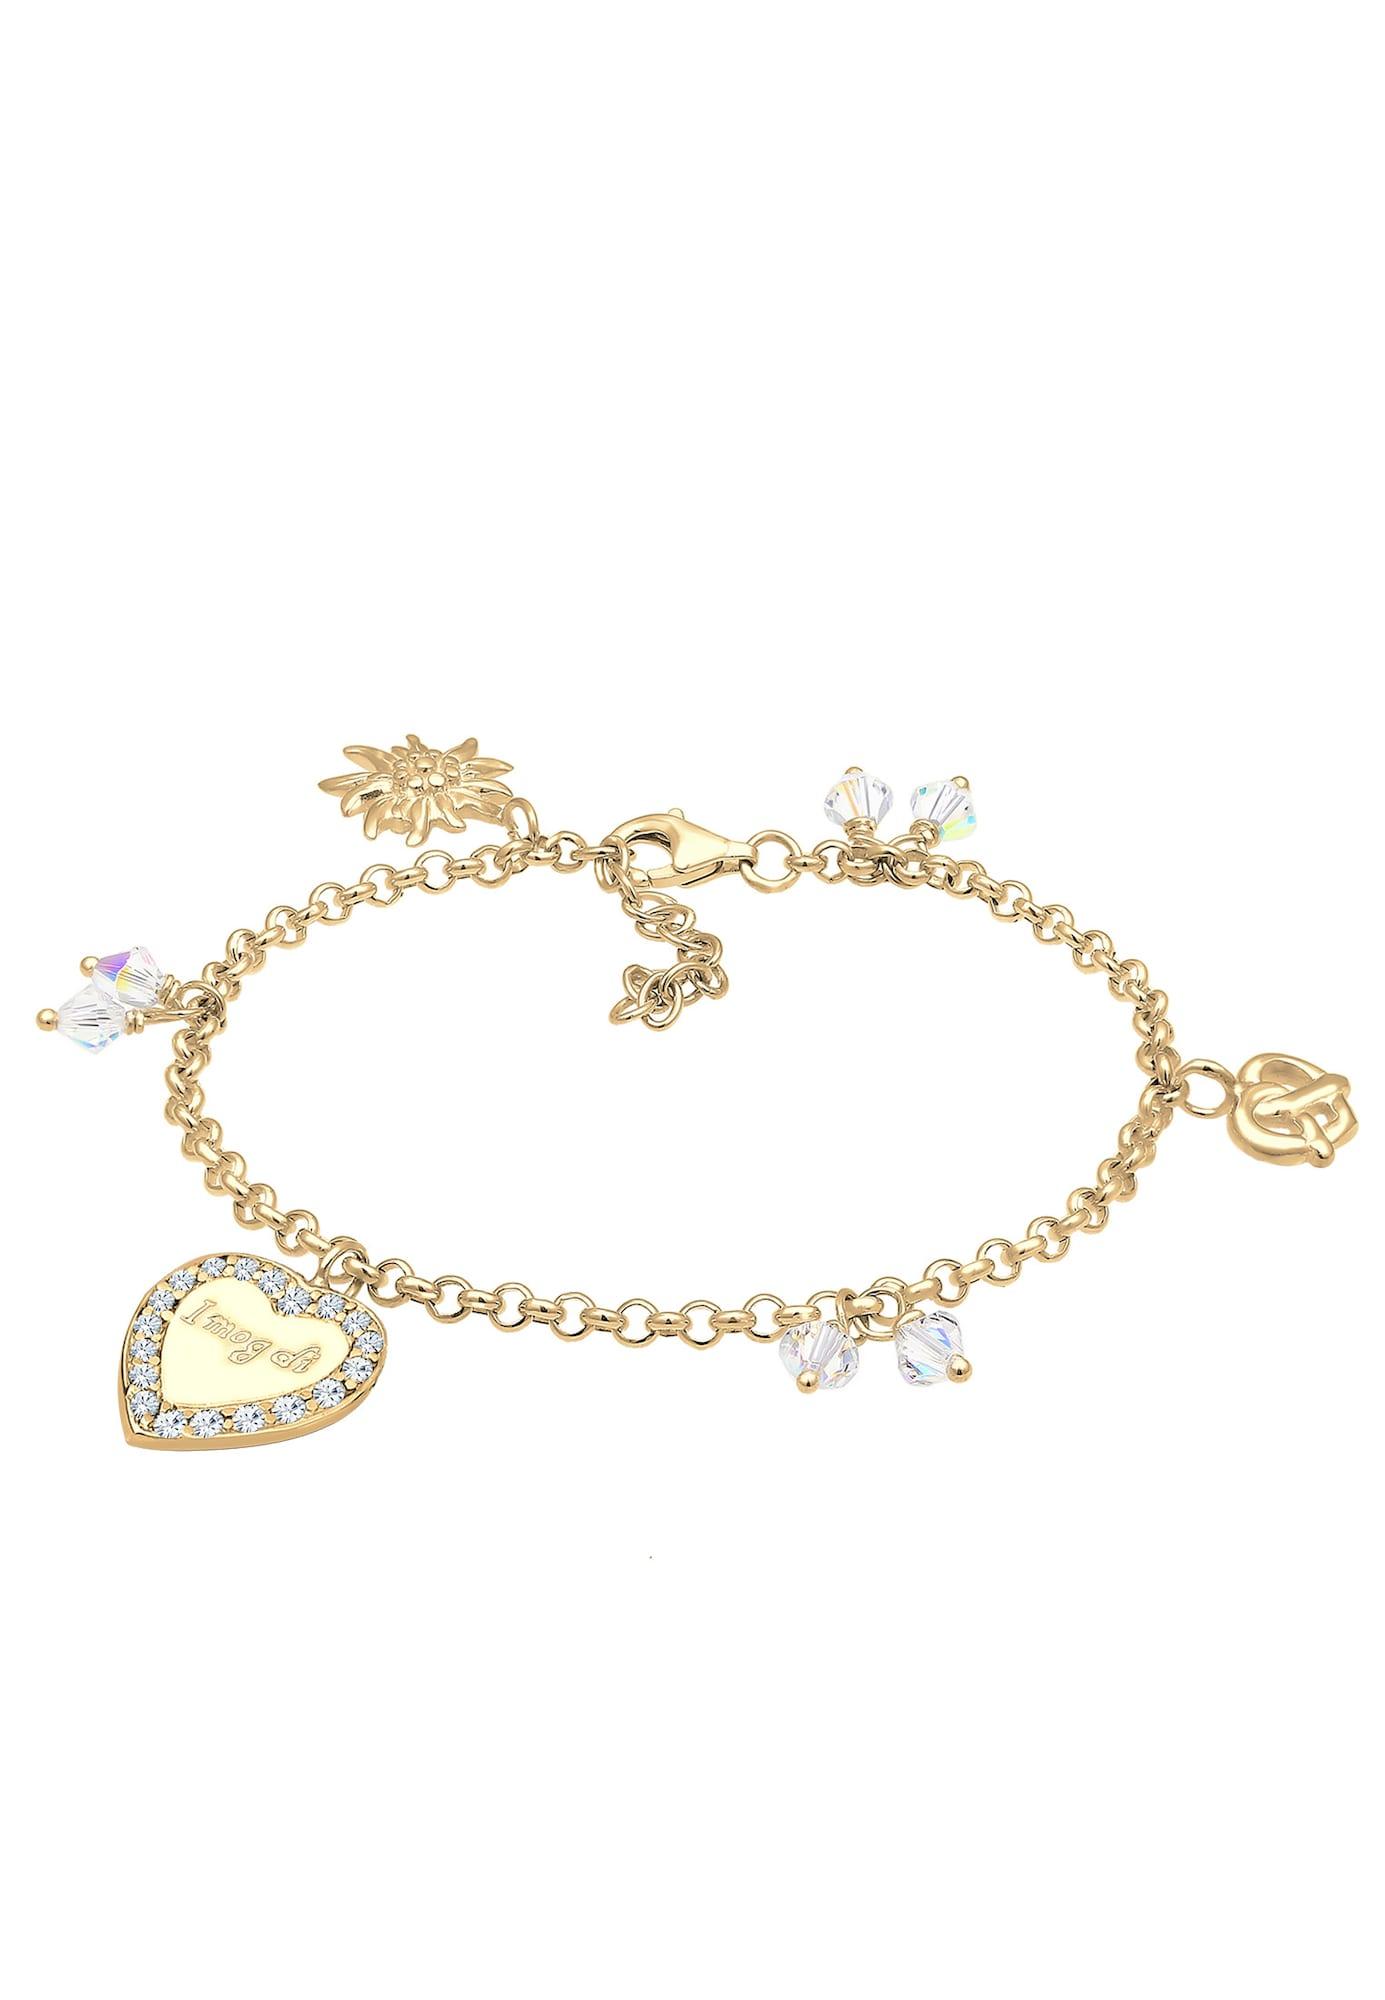 Armband 'Bettelarmband, Brezel, Edelweiss, Herz, Wiesn' | Schmuck > Armbänder > Bettelarmbänder | ELLI